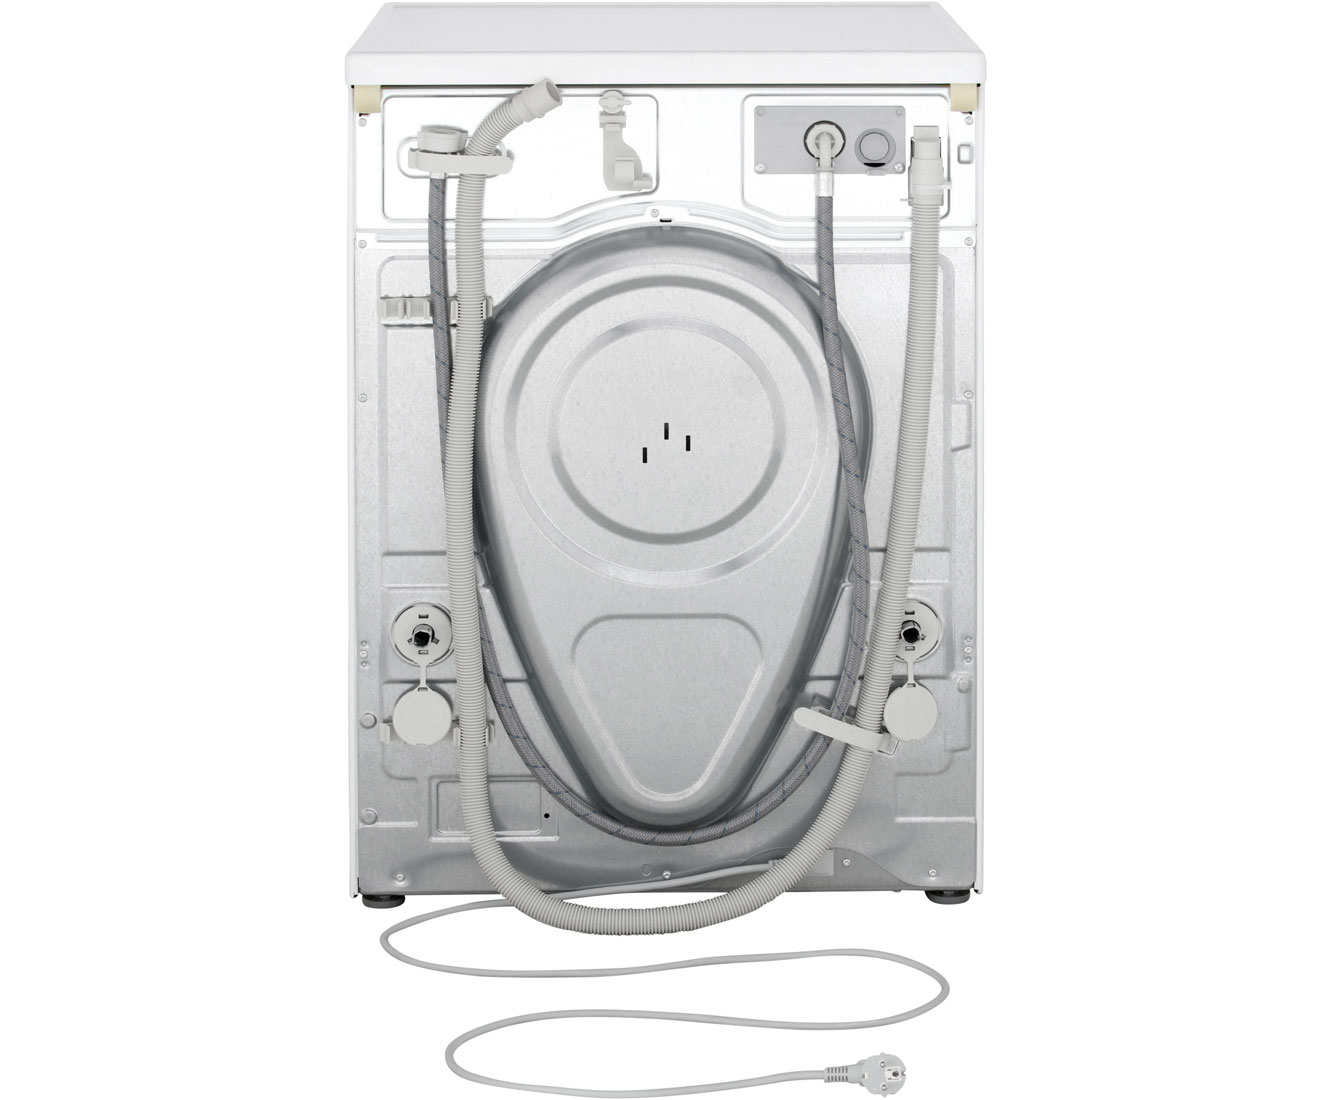 Miele WDB 005 WCS Waschmaschine 7 kg, 1400 U/Min, A+++